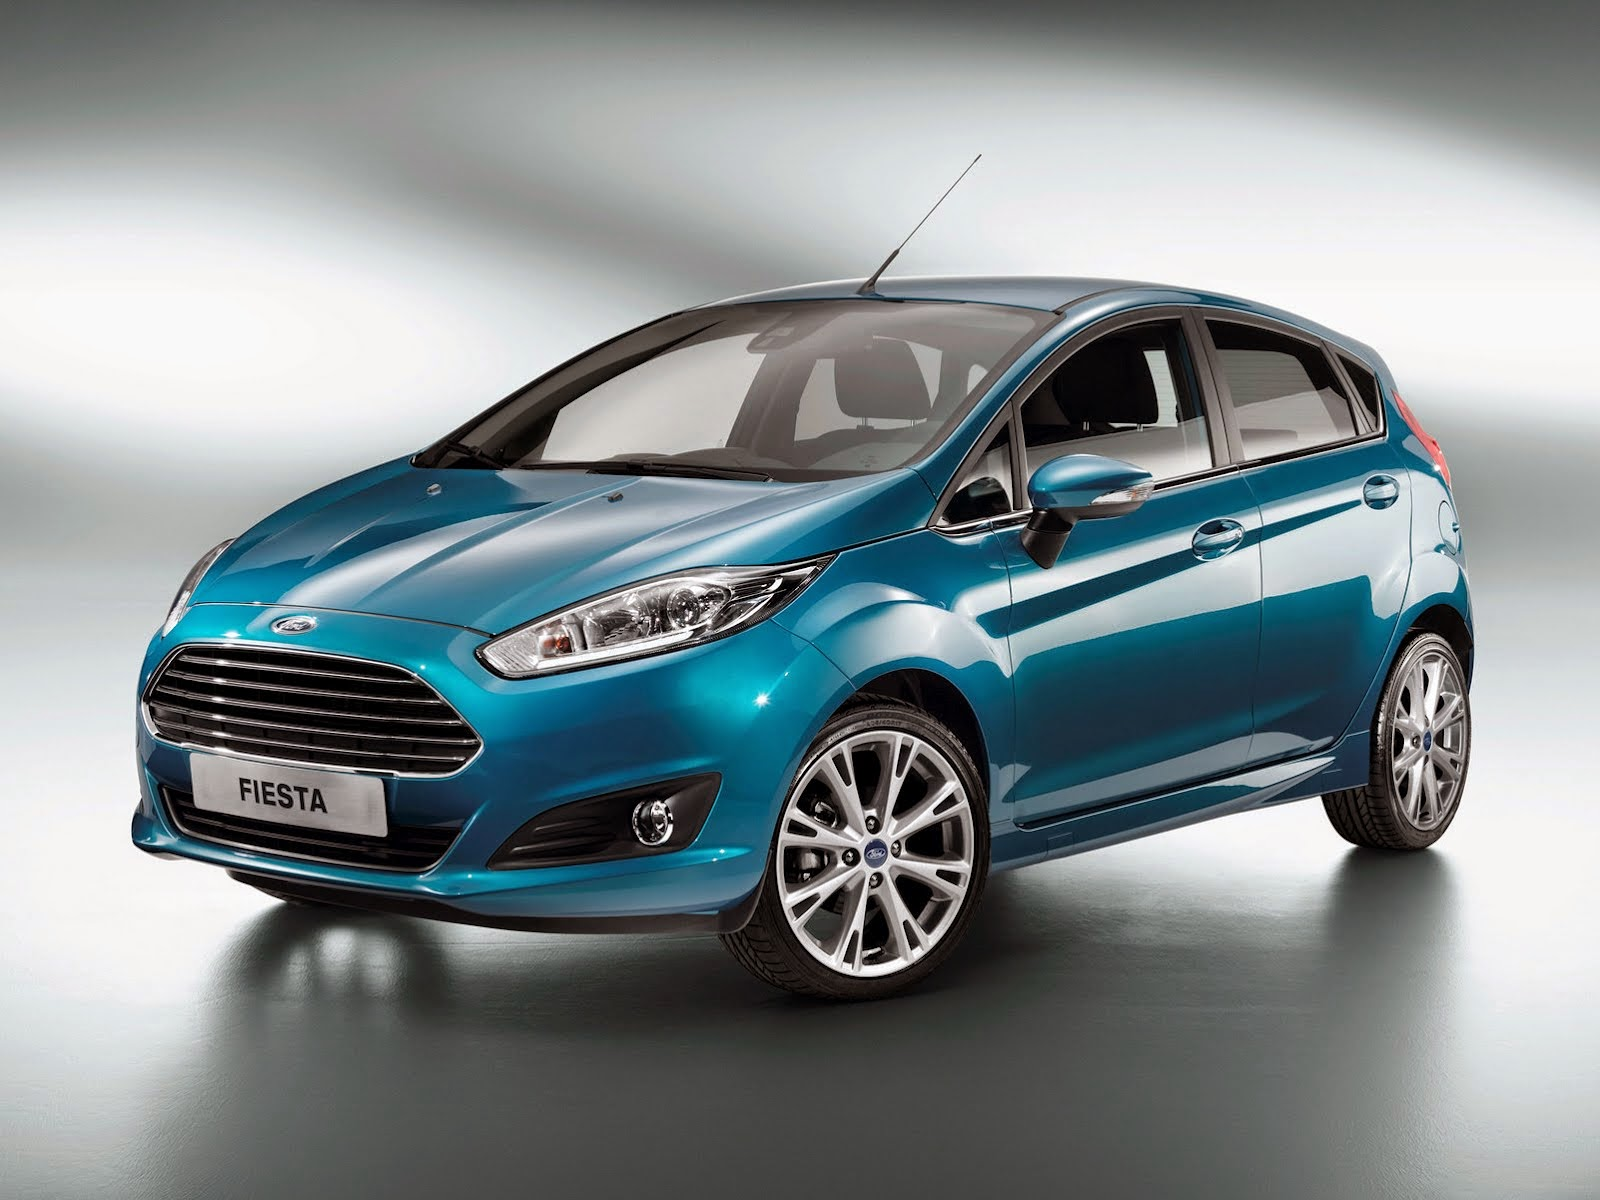 http://3.bp.blogspot.com/-6-Z59-c1bpE/U0fIh-hZCkI/AAAAAAAAABo/Tv2p6CvnmfY/s1600/2014-ford-fiesta-facelift-to-get-10-liter-ecoboost-in-us_1.jpg